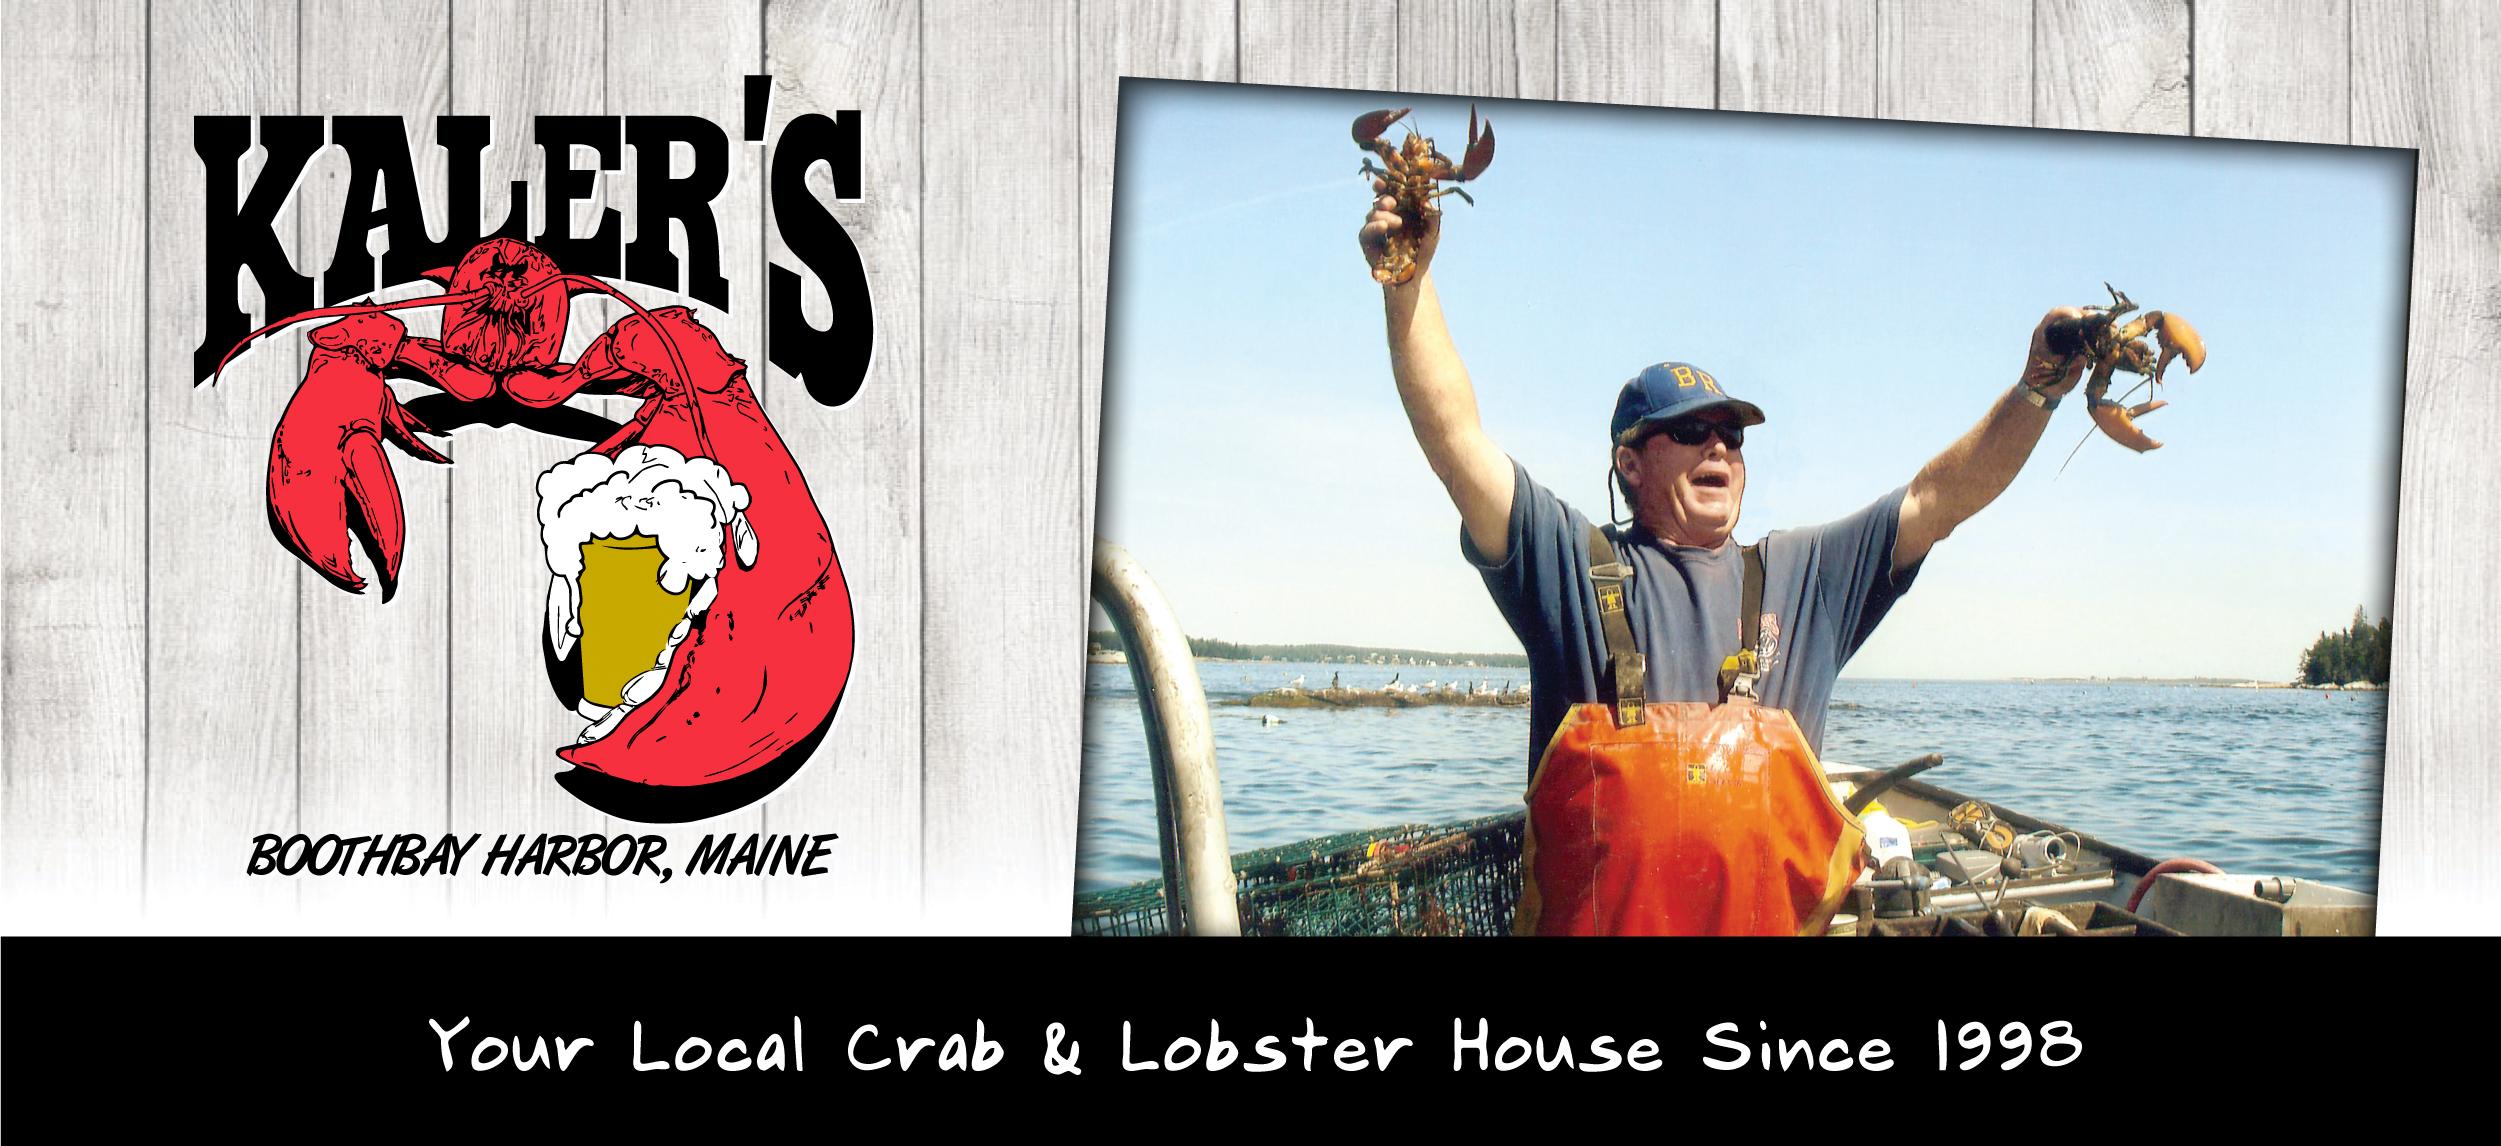 Kaler's Restaurant - Fresh Local Seafood - Boothbay Harbor, Maine